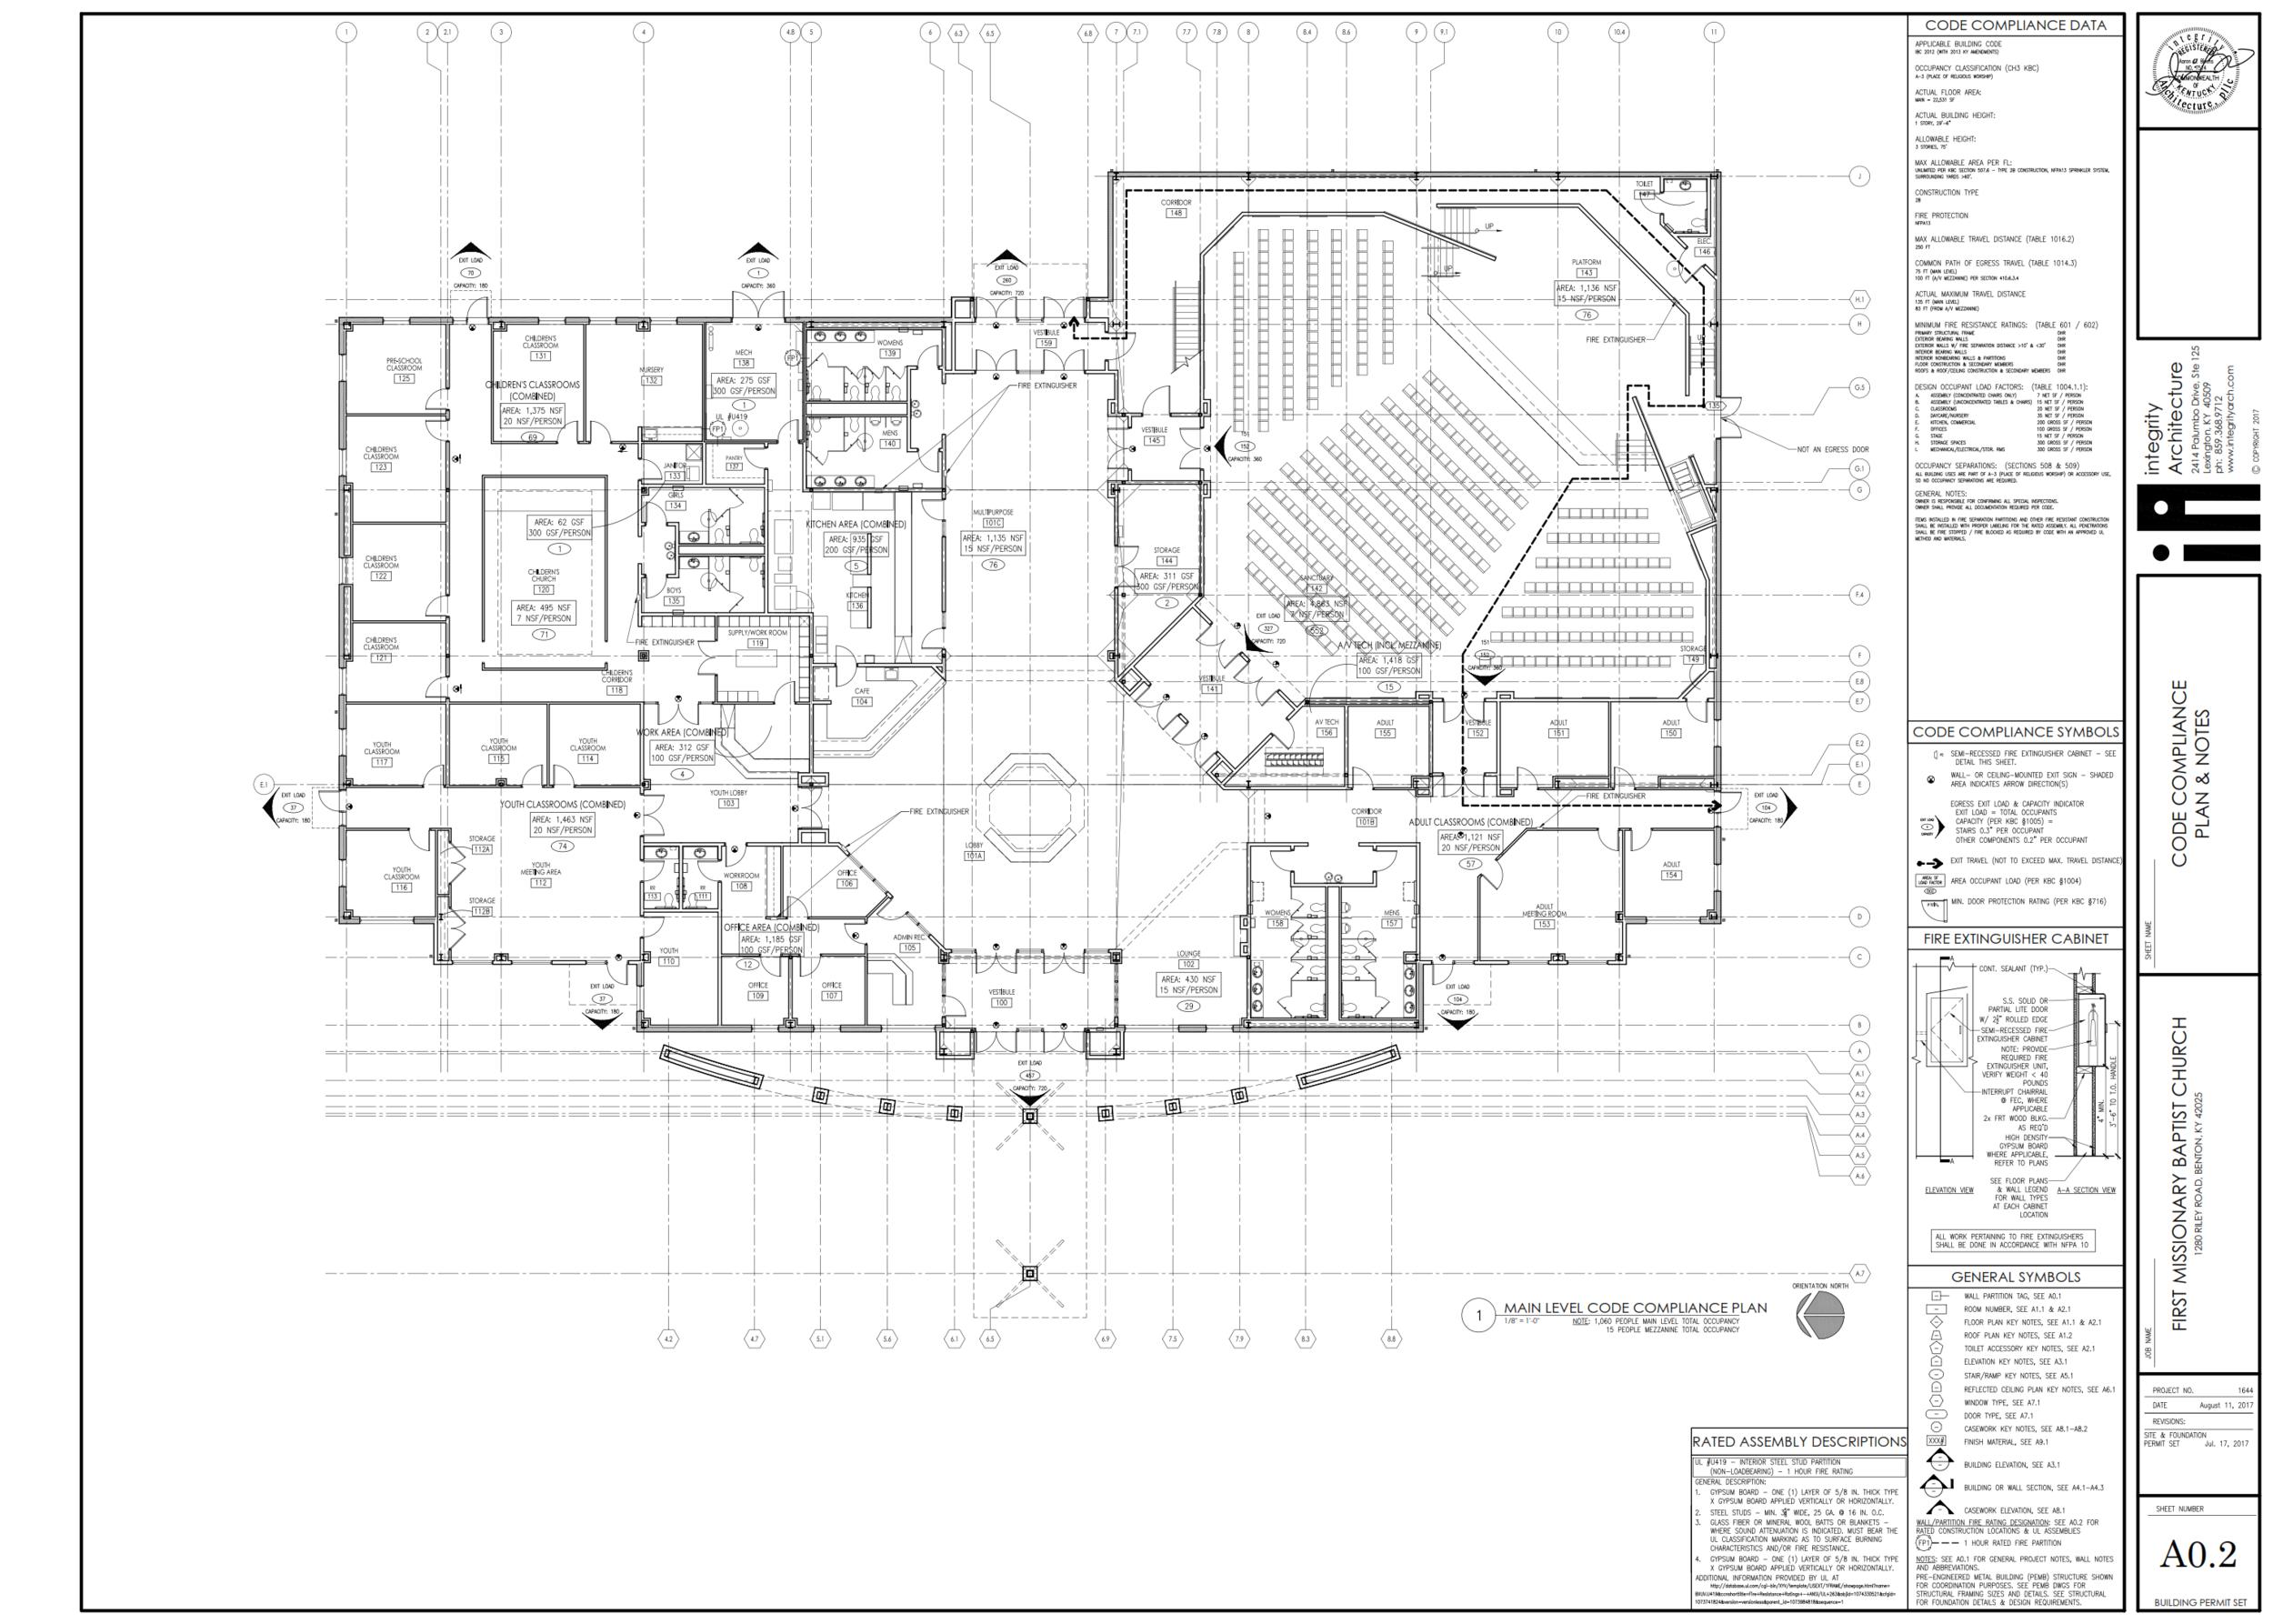 A0.2 FloorPlan (pg.35)_001.png